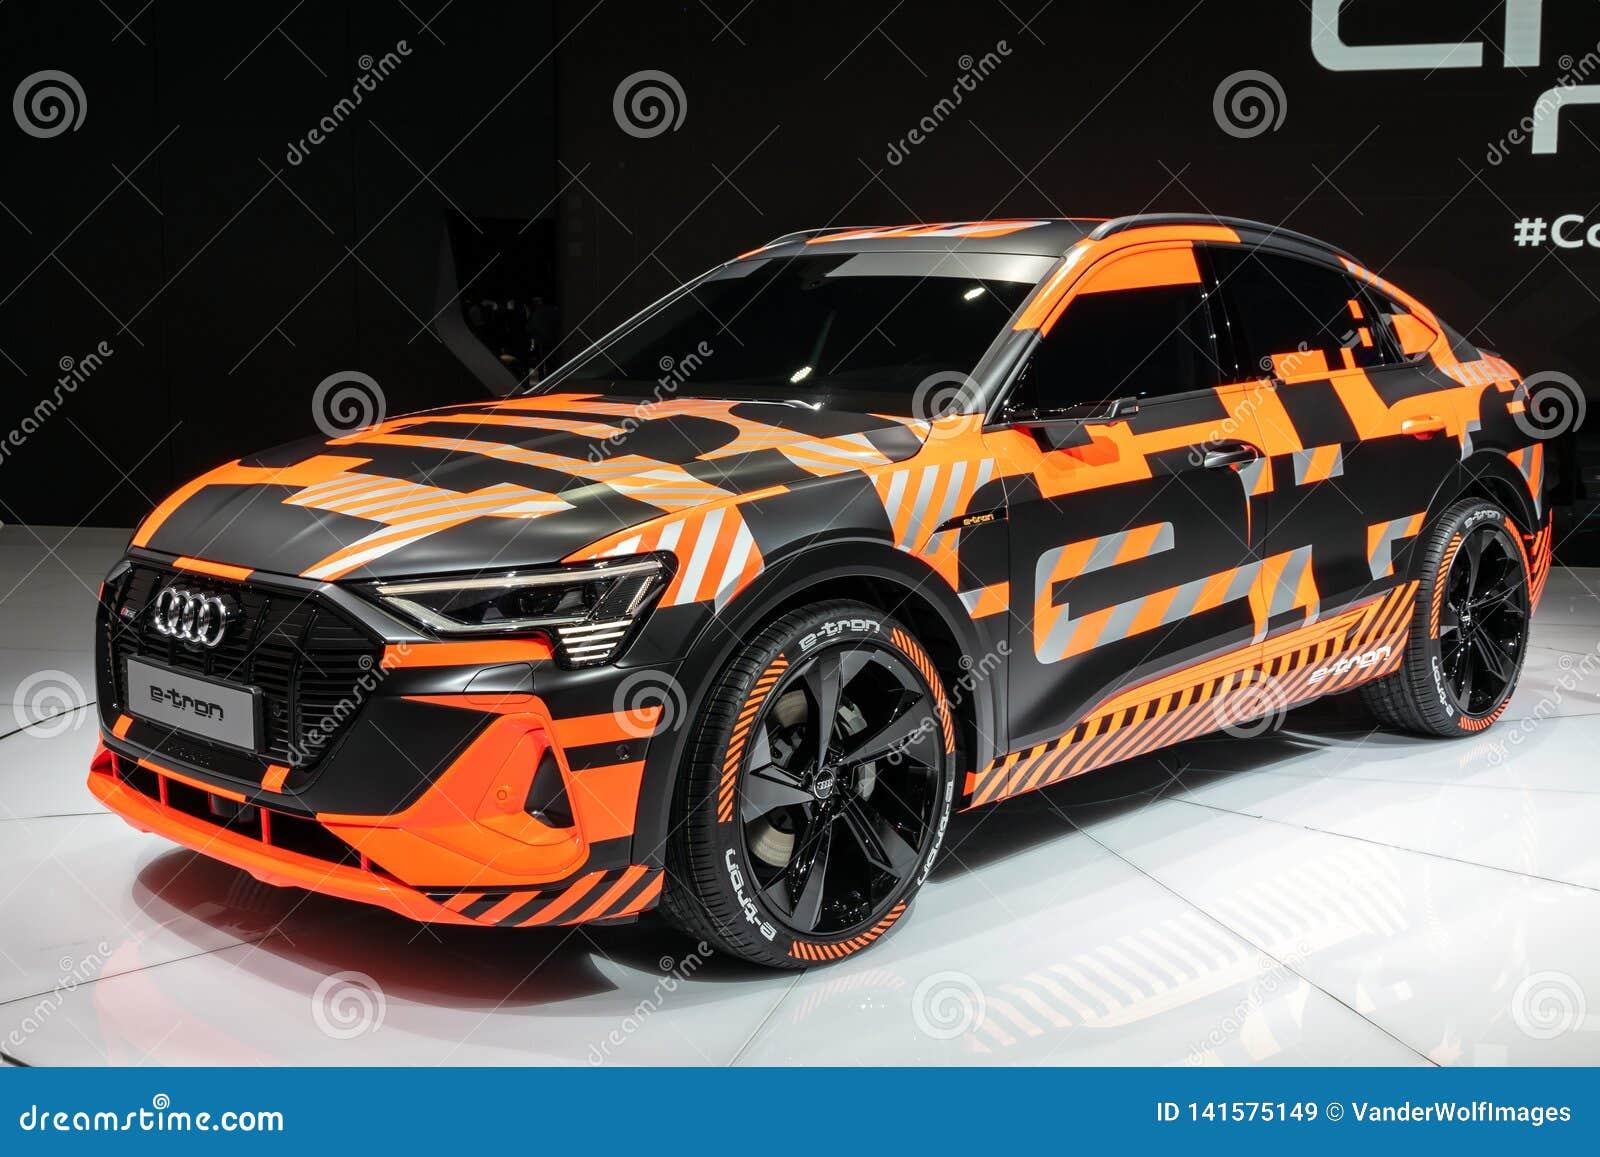 Audi E Tron Sportback Electric Suv Coupe Car Editorial Stock Image Image Of Sports Orange 141575149